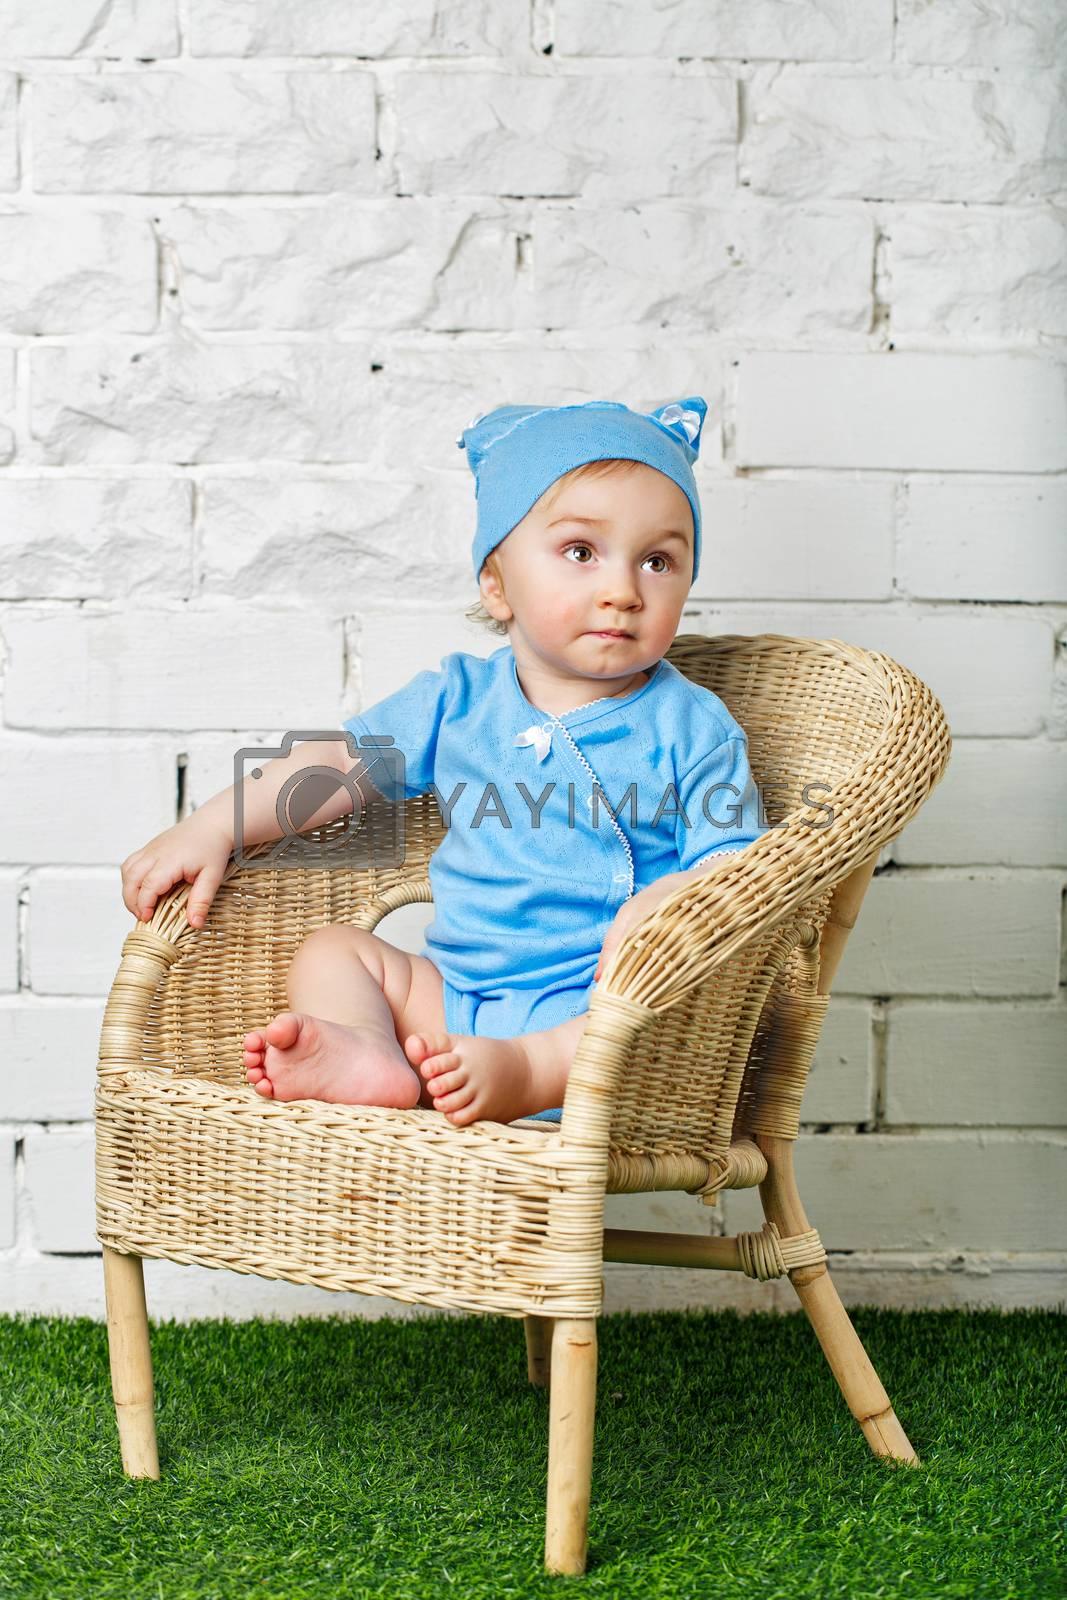 Little boy sitting in a wicker chair on the lawn barefoot